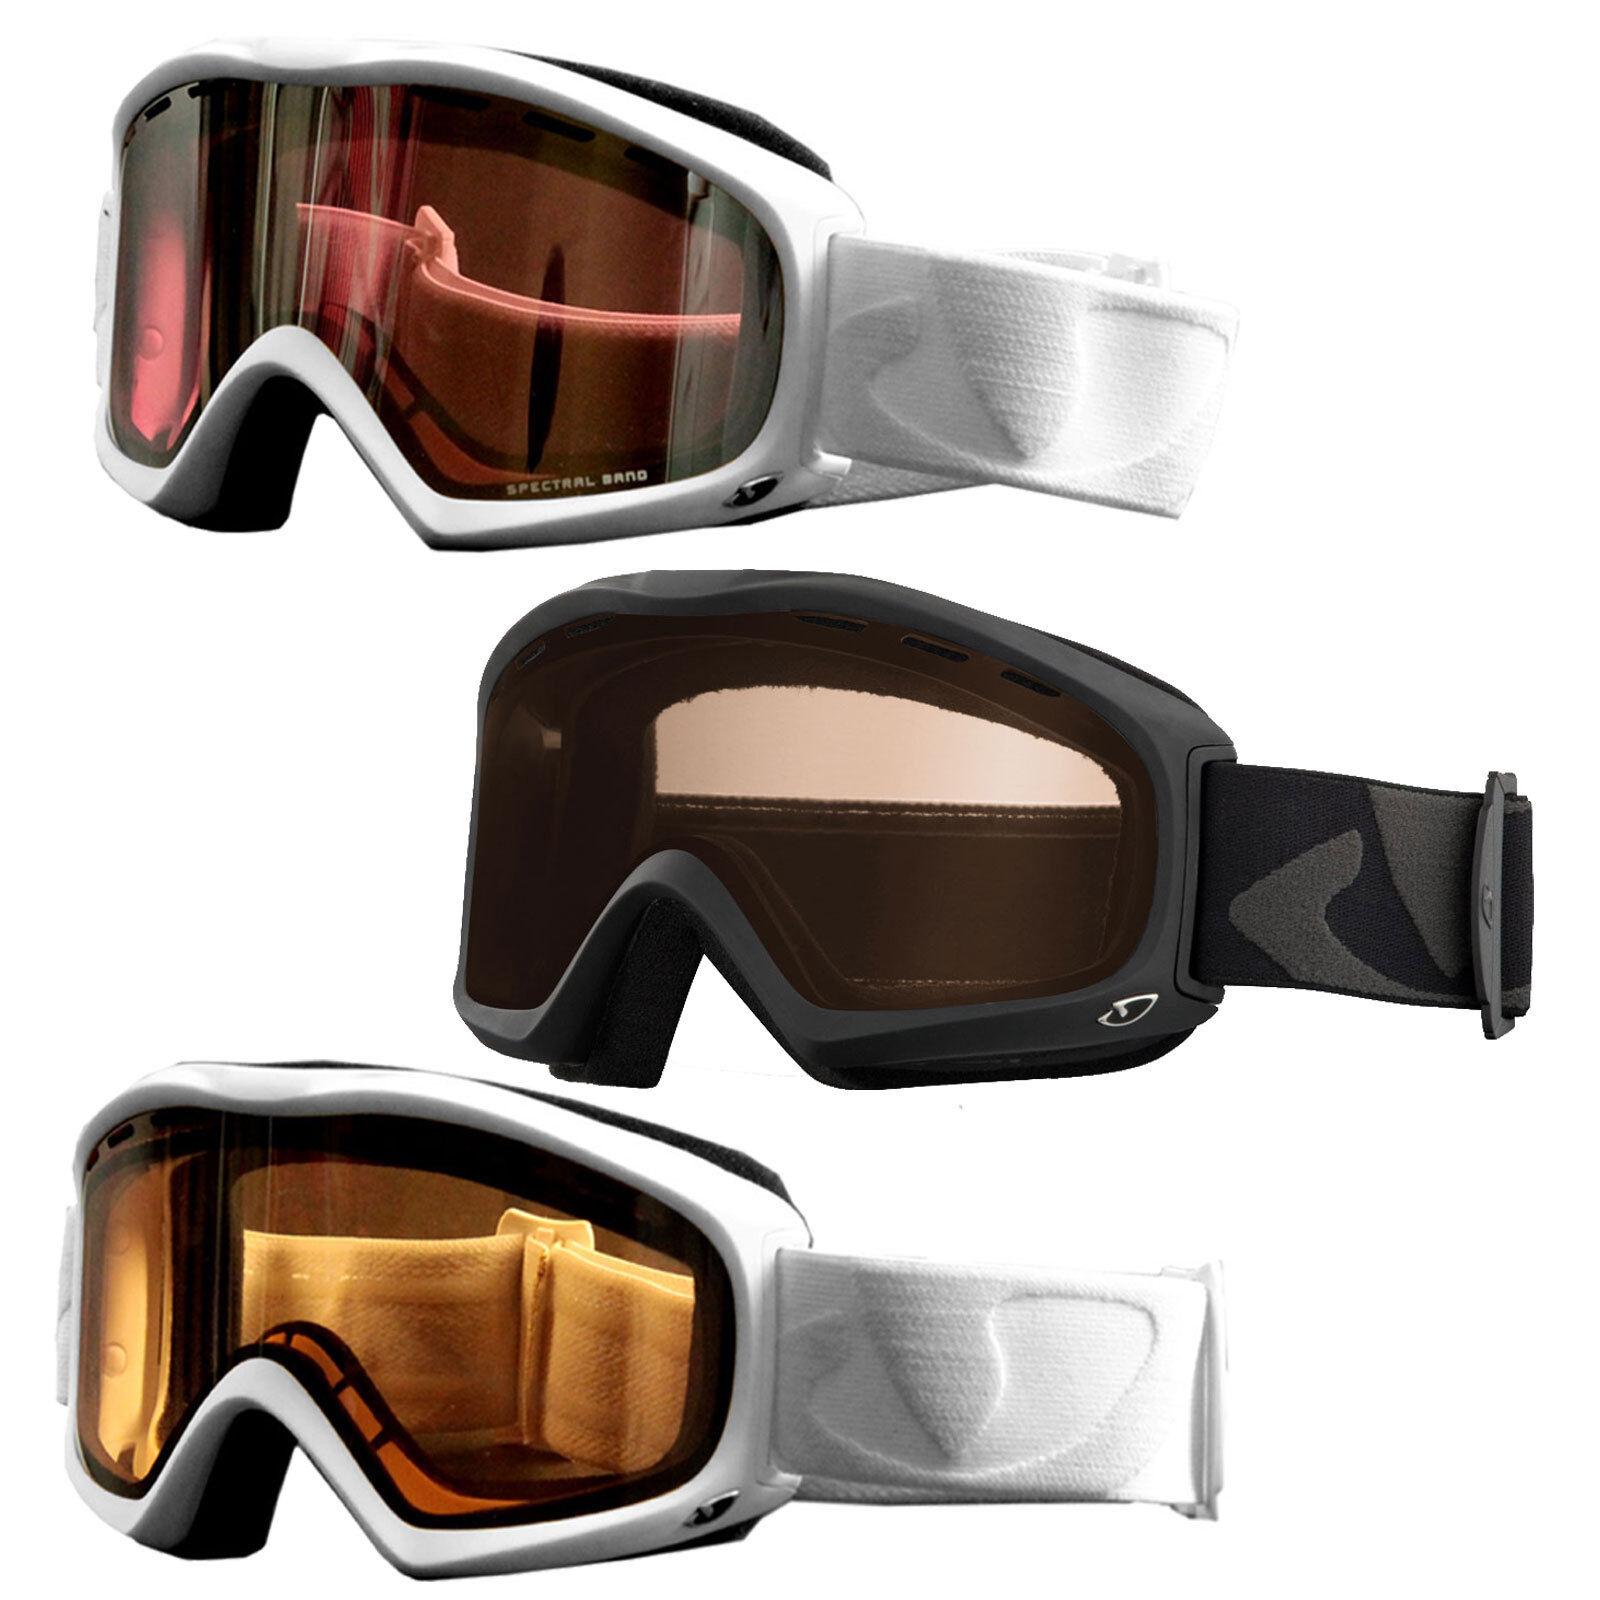 Giro Signal Skibrille Snowboardbrille Goggle Ski-Snowboard-Brille Schneebrille